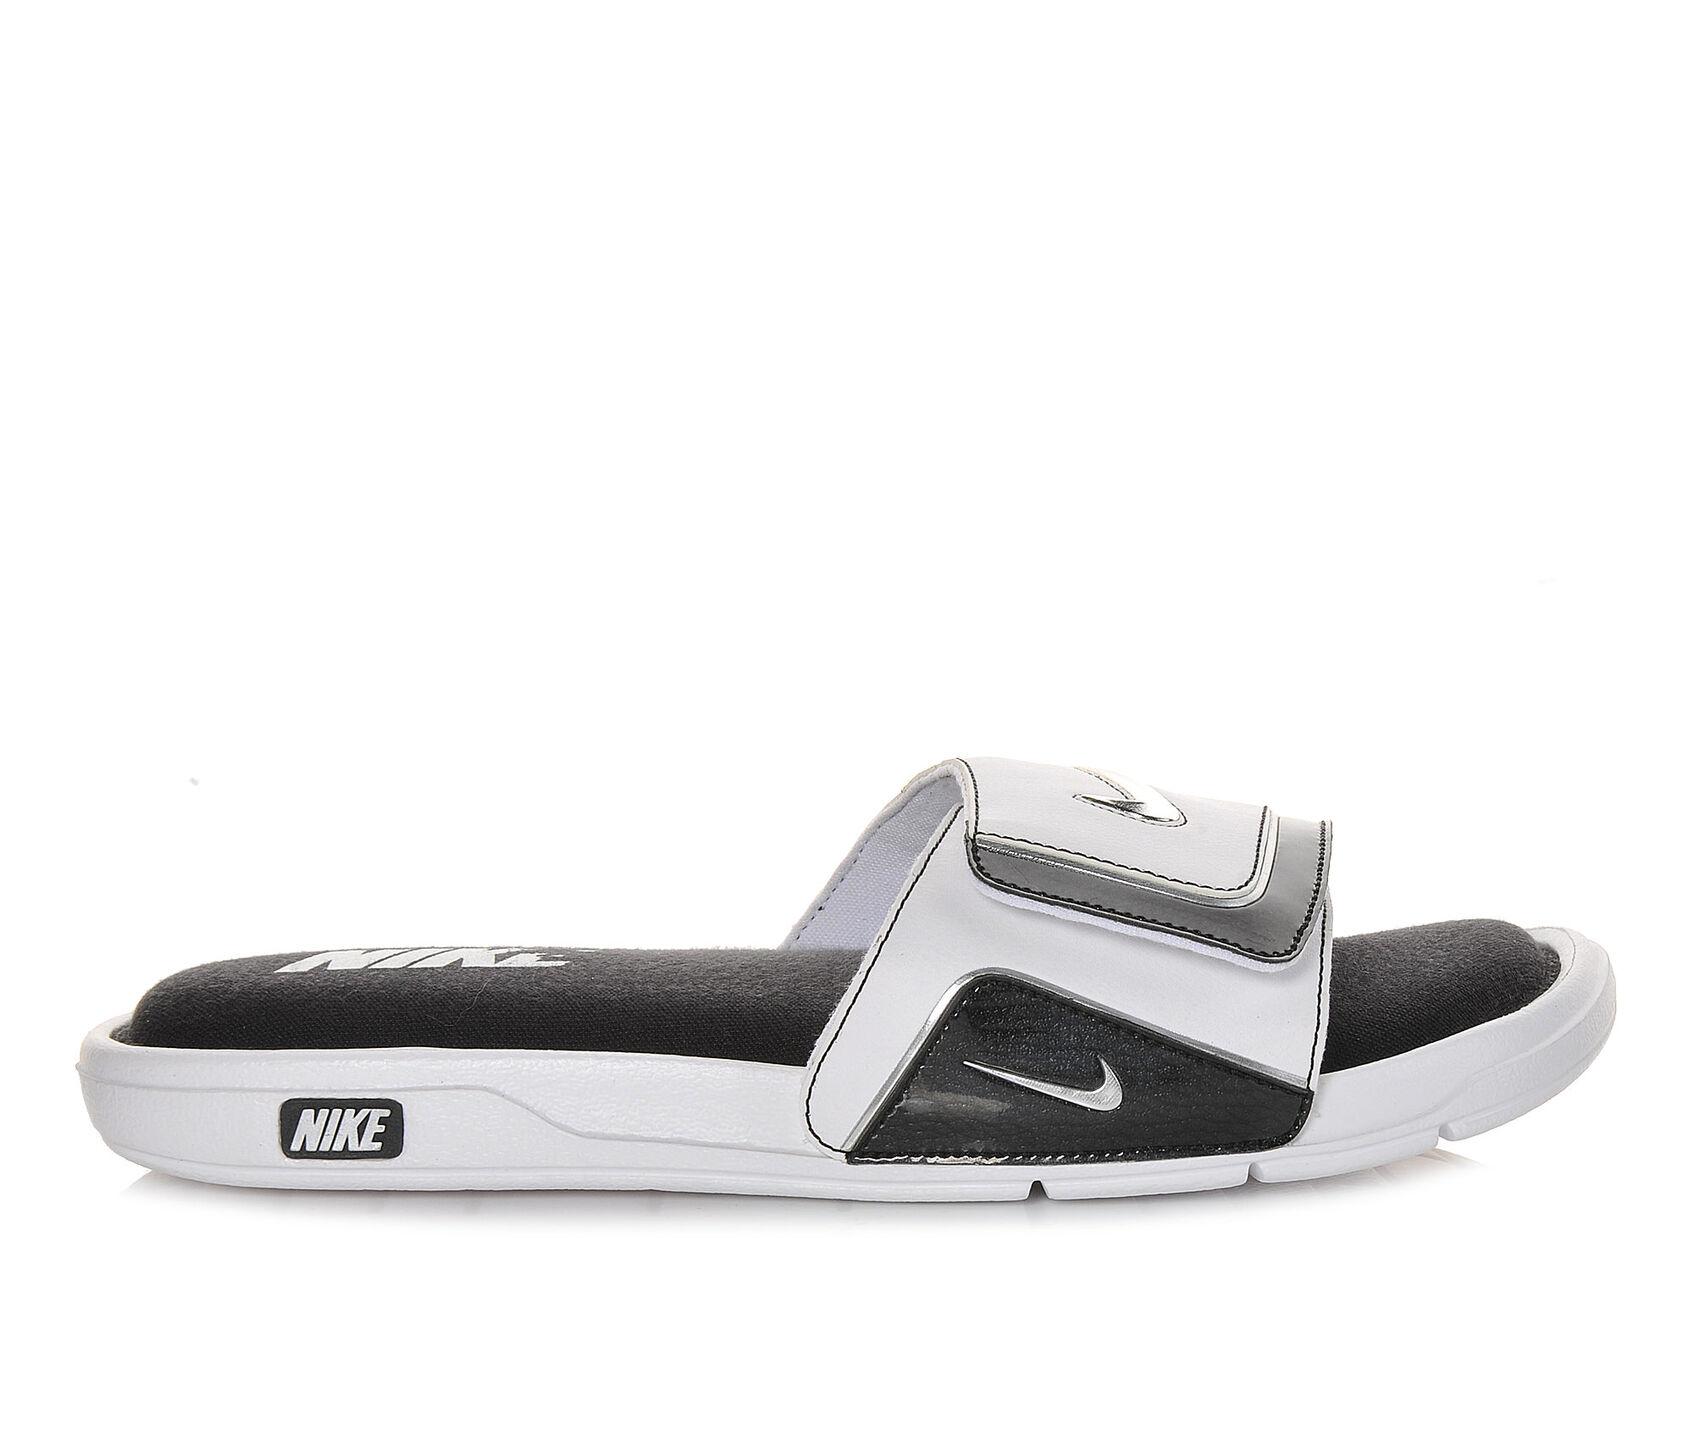 little amazon game kid comfort shoes white boy royal s black dp m nike bags slide comforter uk us sandal trainer sport co